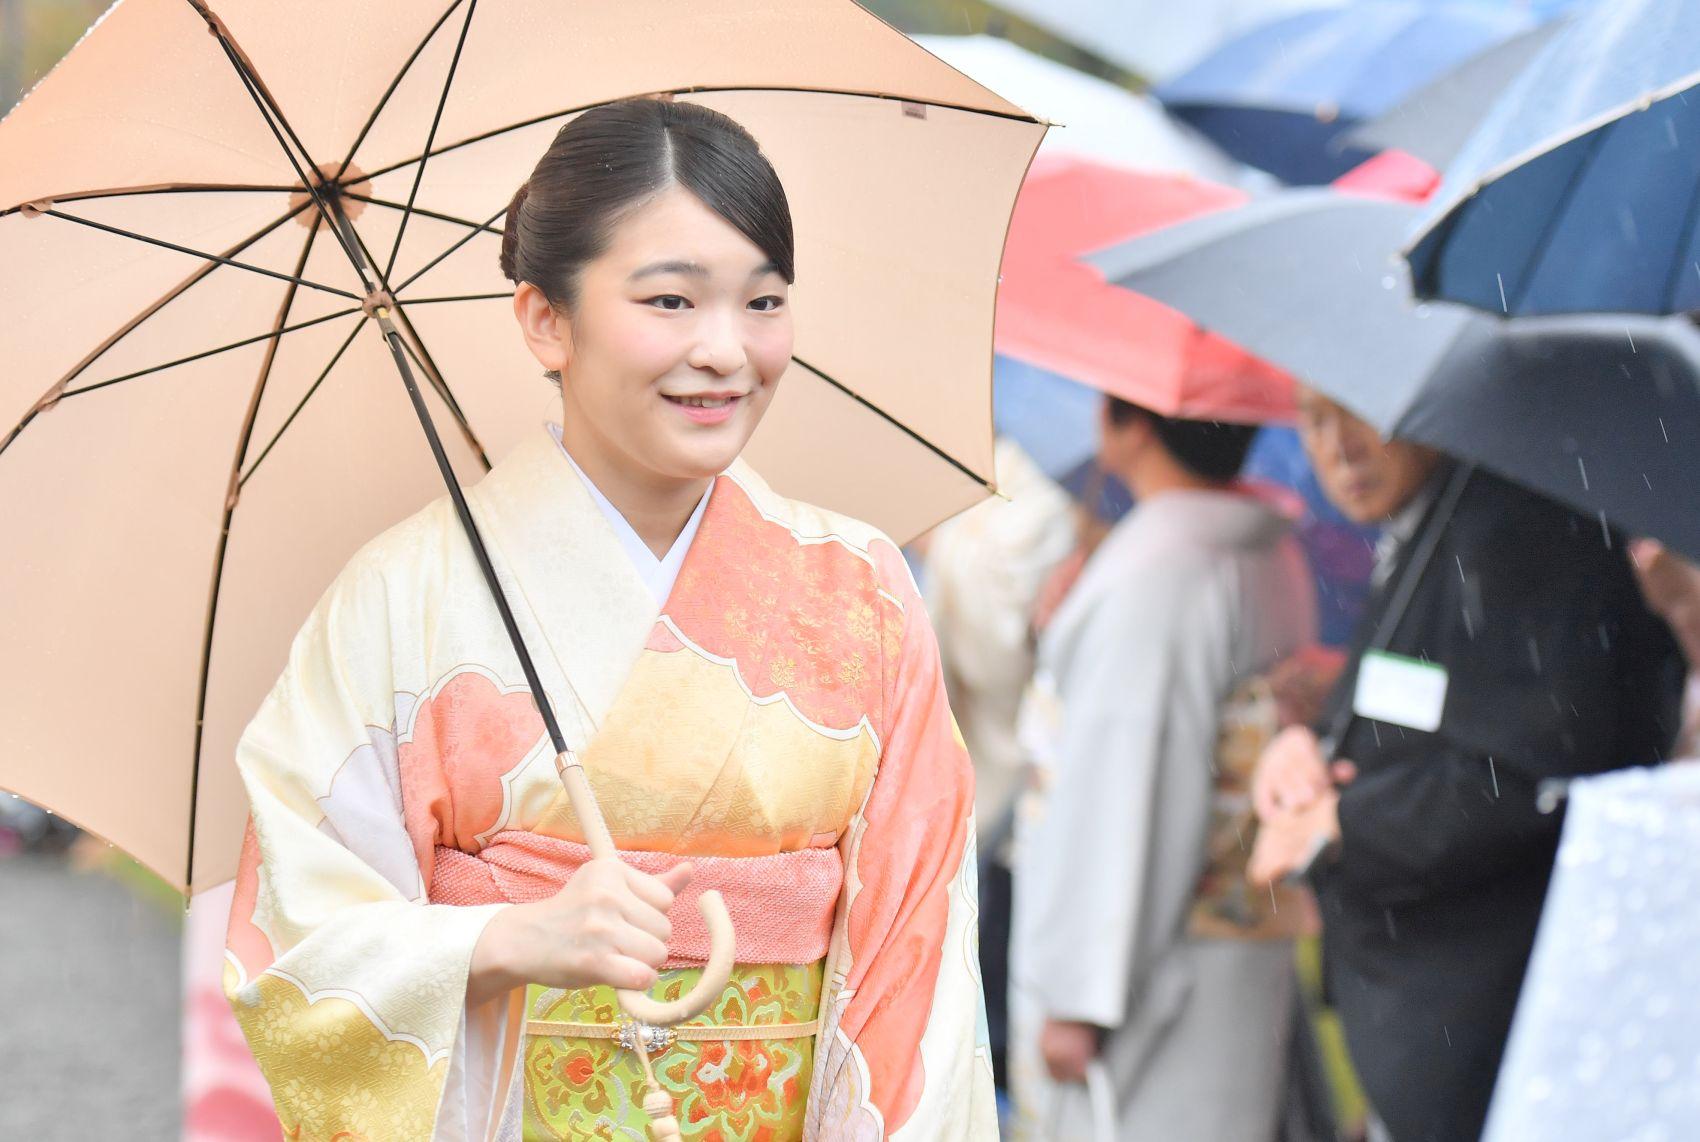 Emperor, Empress Host the Last Imperial Garden Party of the Heisei Era